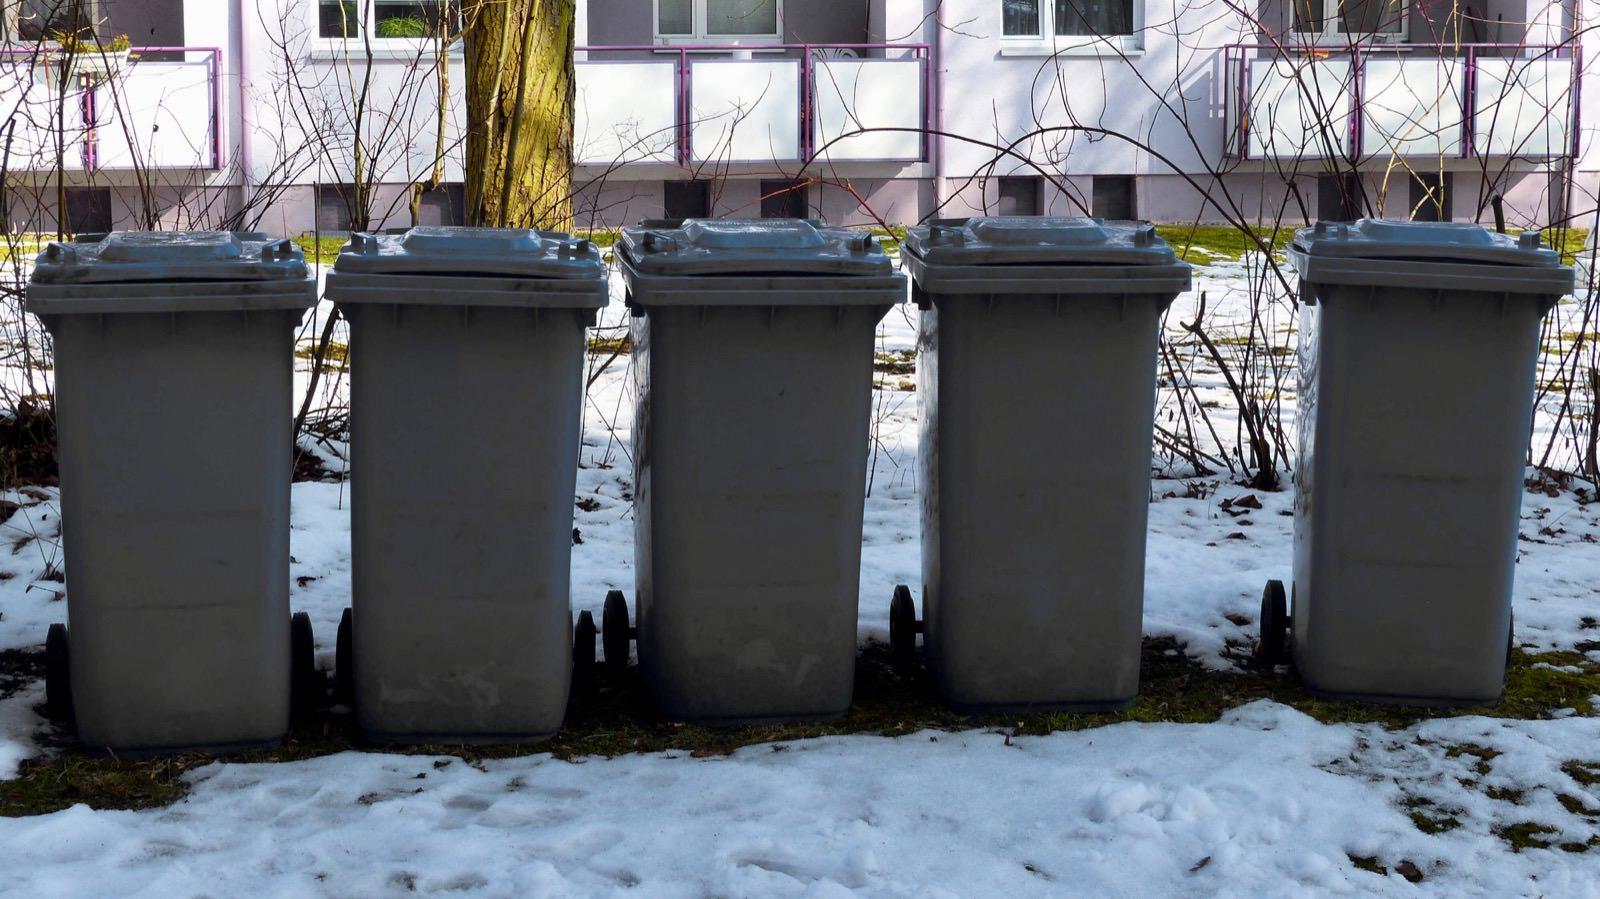 Abfalltonnen im Schnee (Symbolbild)   Foto: CC0 via pixabay